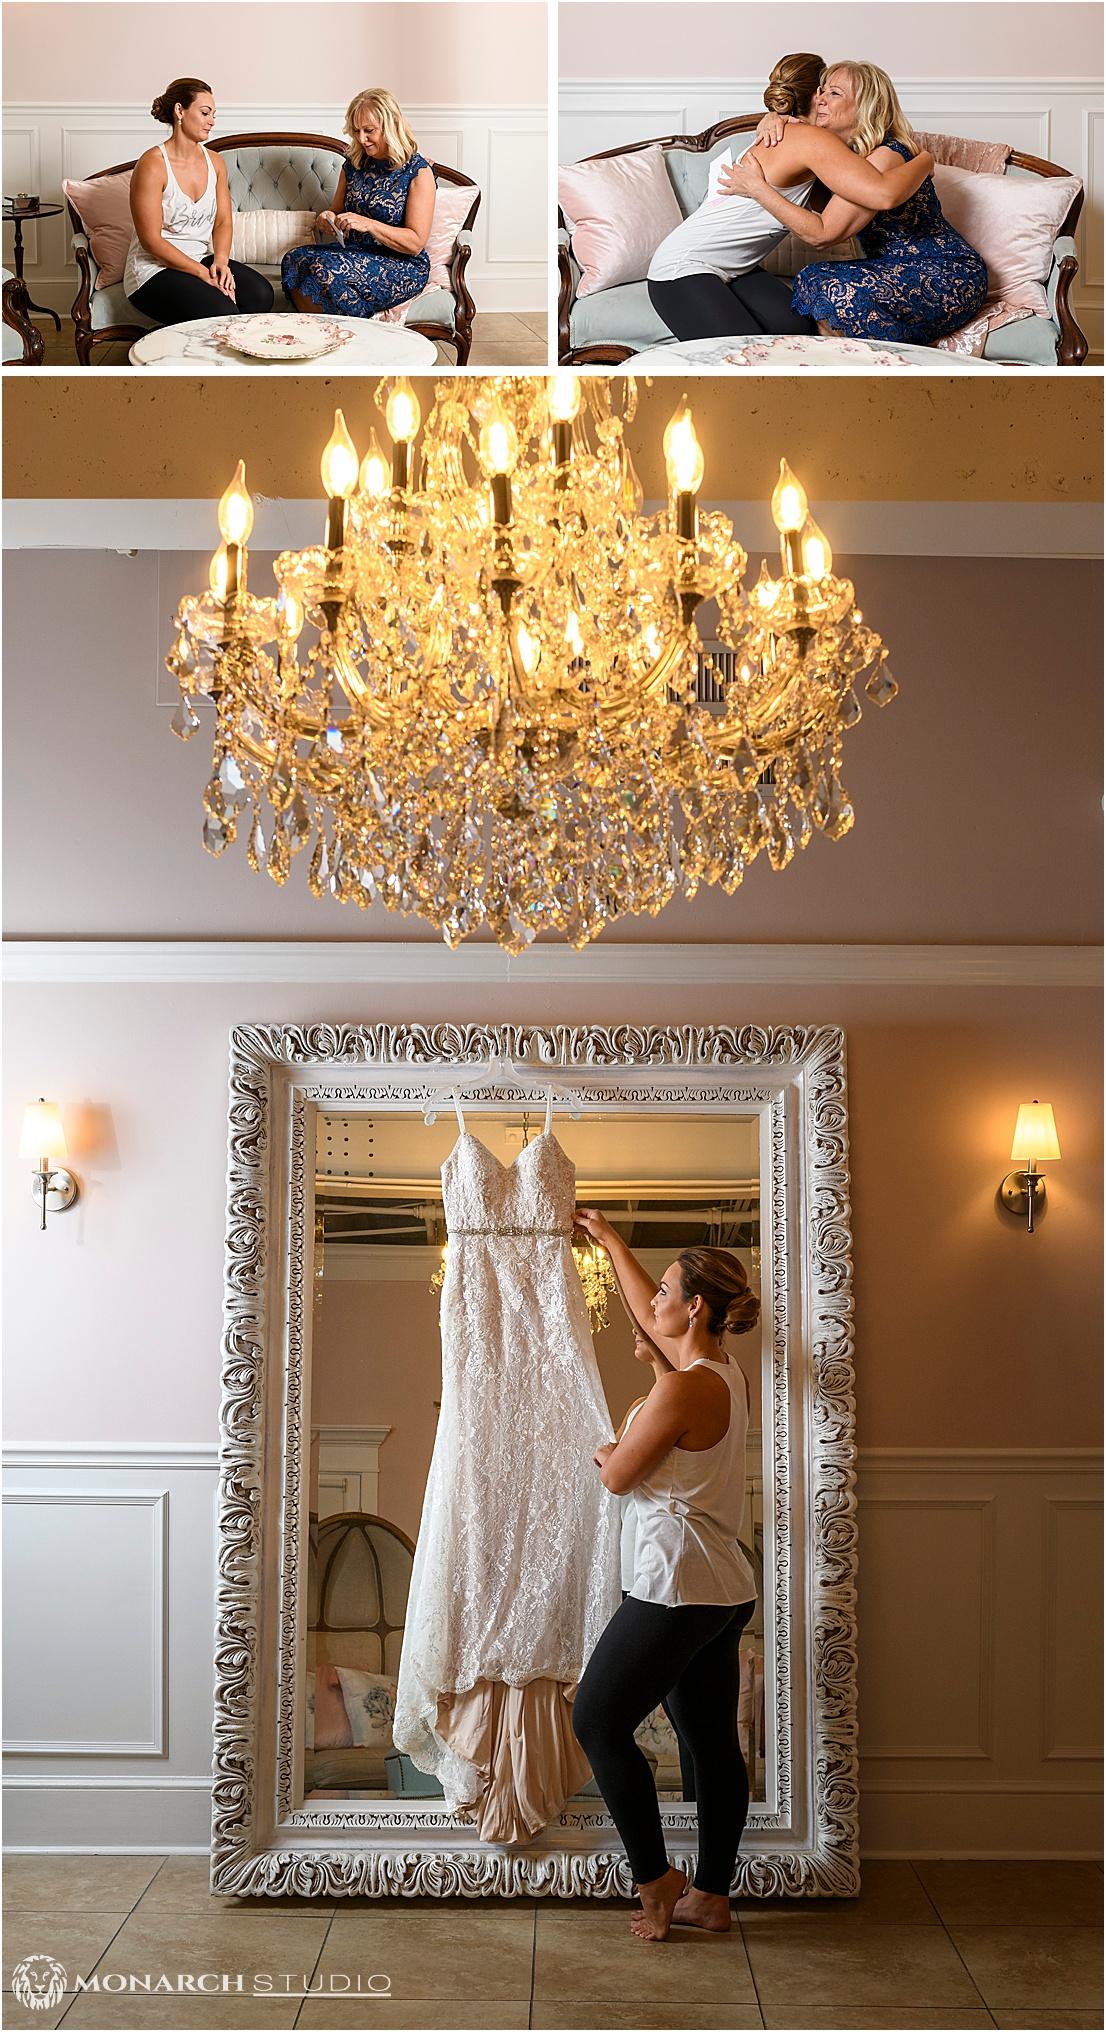 029-whiteroom-wedding-photographer-2019-05-22_0011.jpg